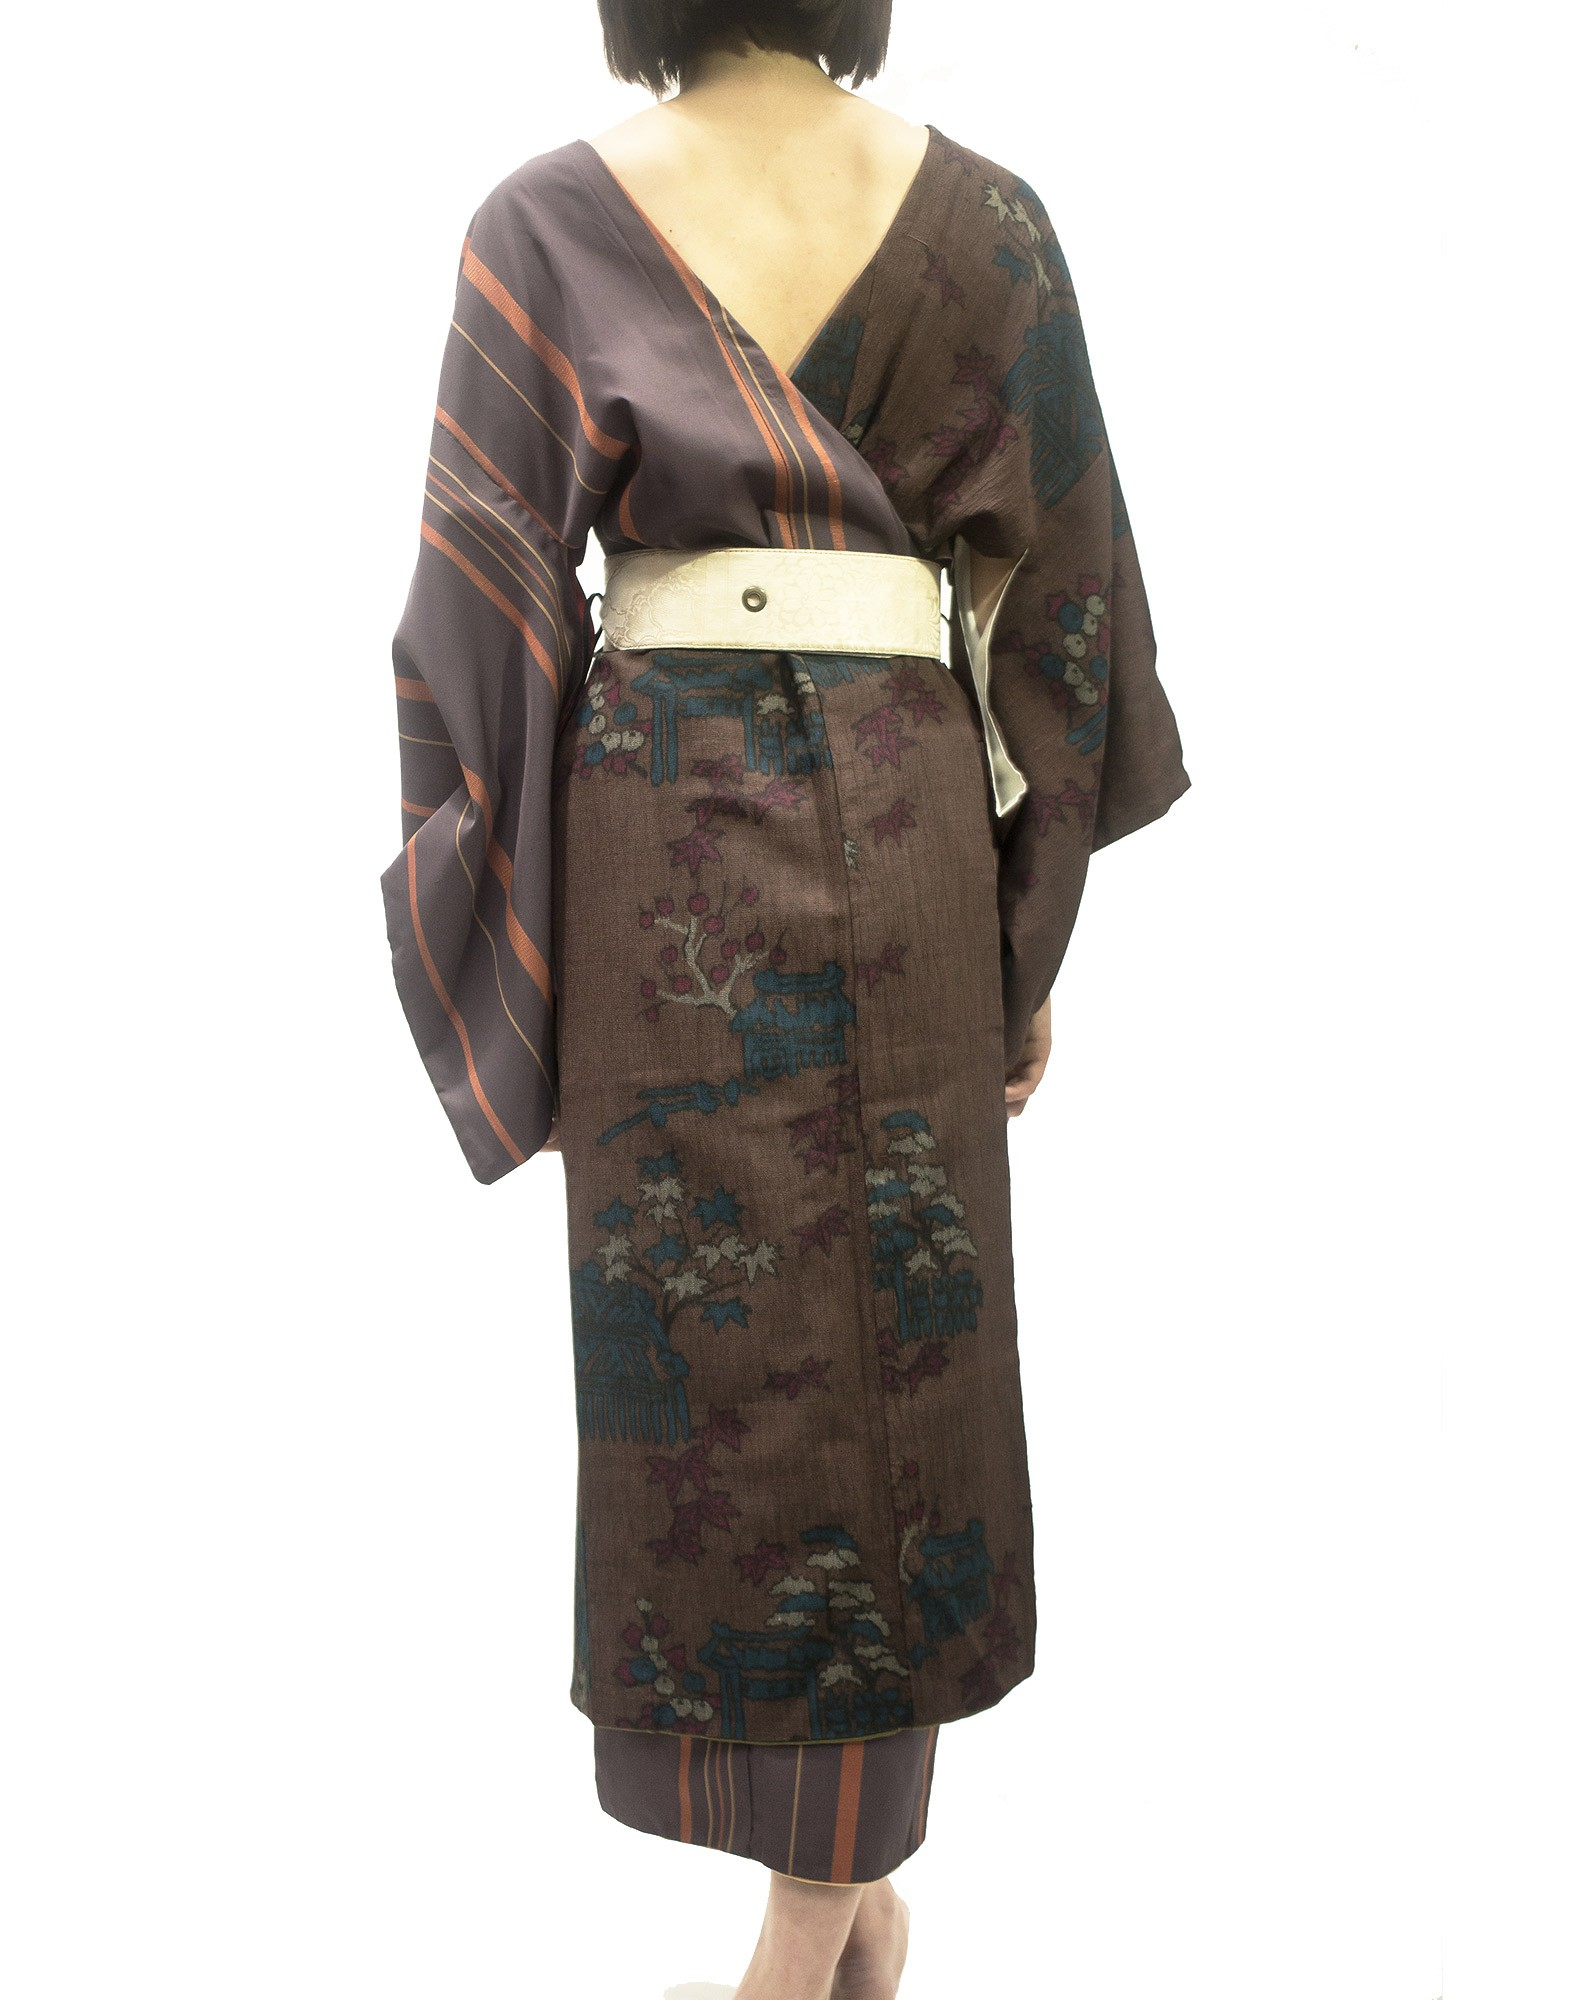 2 in 1 kimono dress